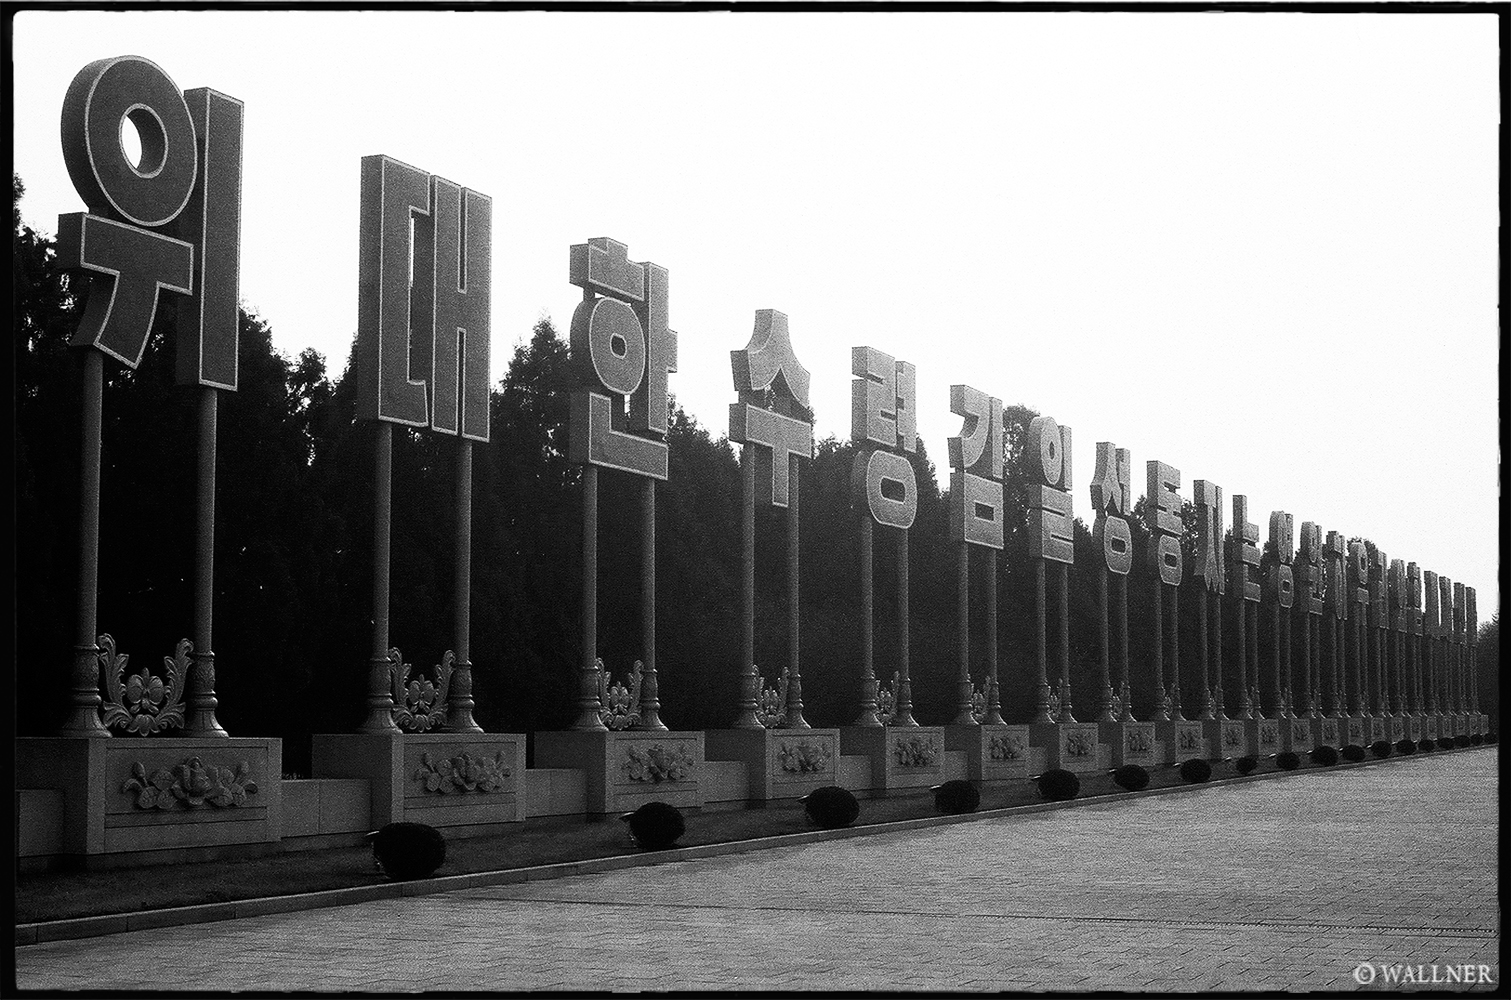 35mmPatrikWallner_Pyongyang_KoryoLOWQ